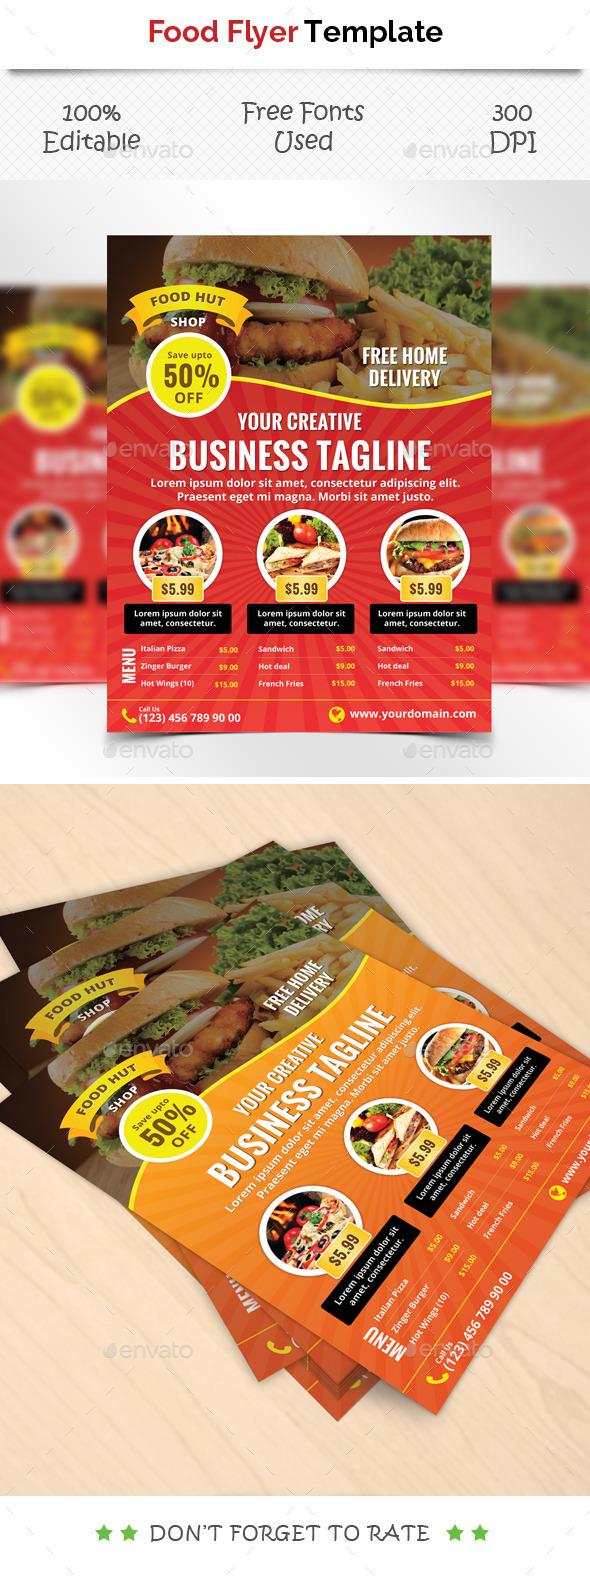 Food Flyer Tempate - Restaurant Flyers